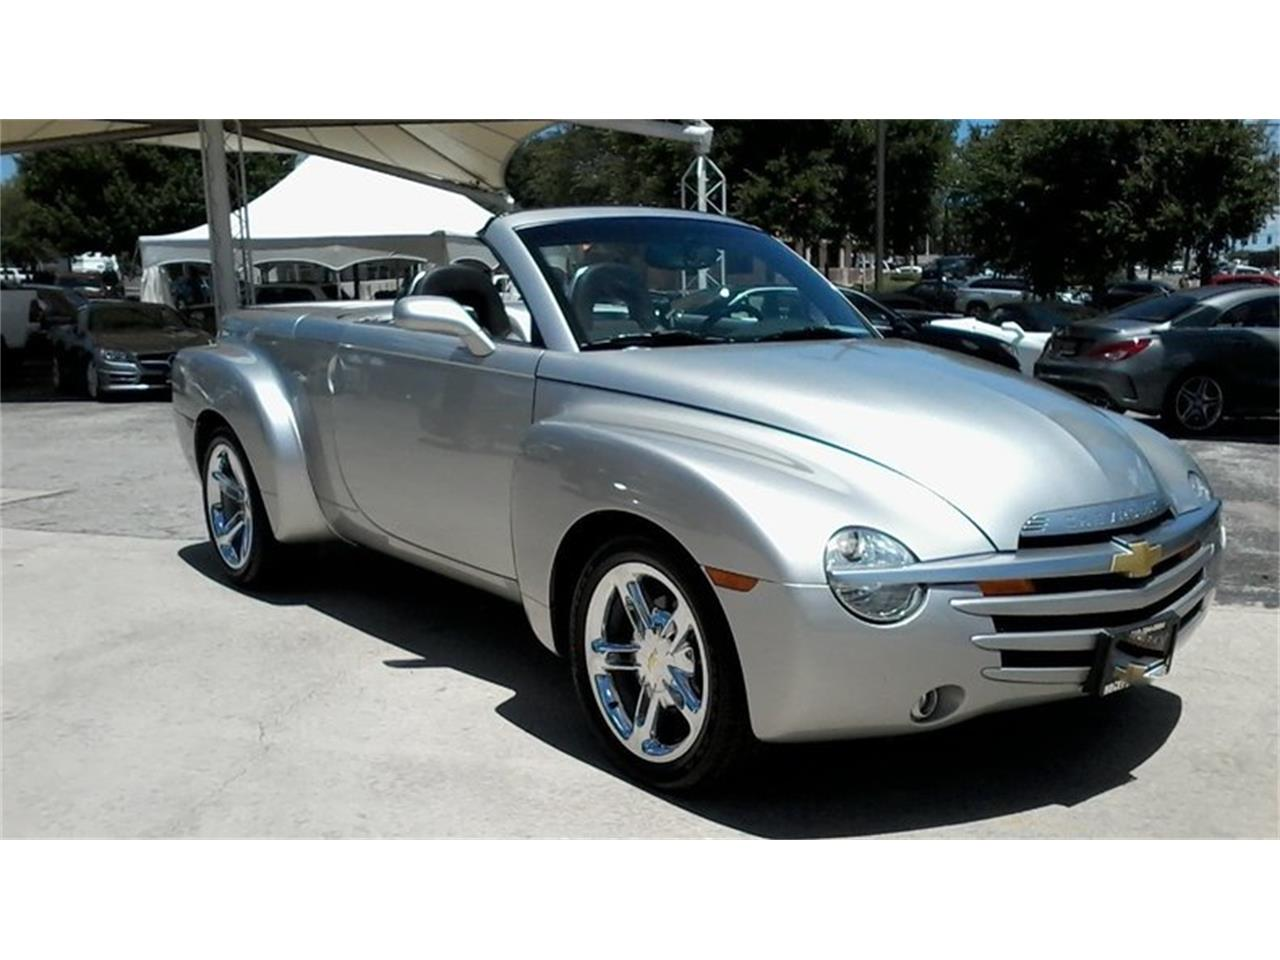 2005 Chevrolet Ssr For Sale Classiccars Com Cc 1076297